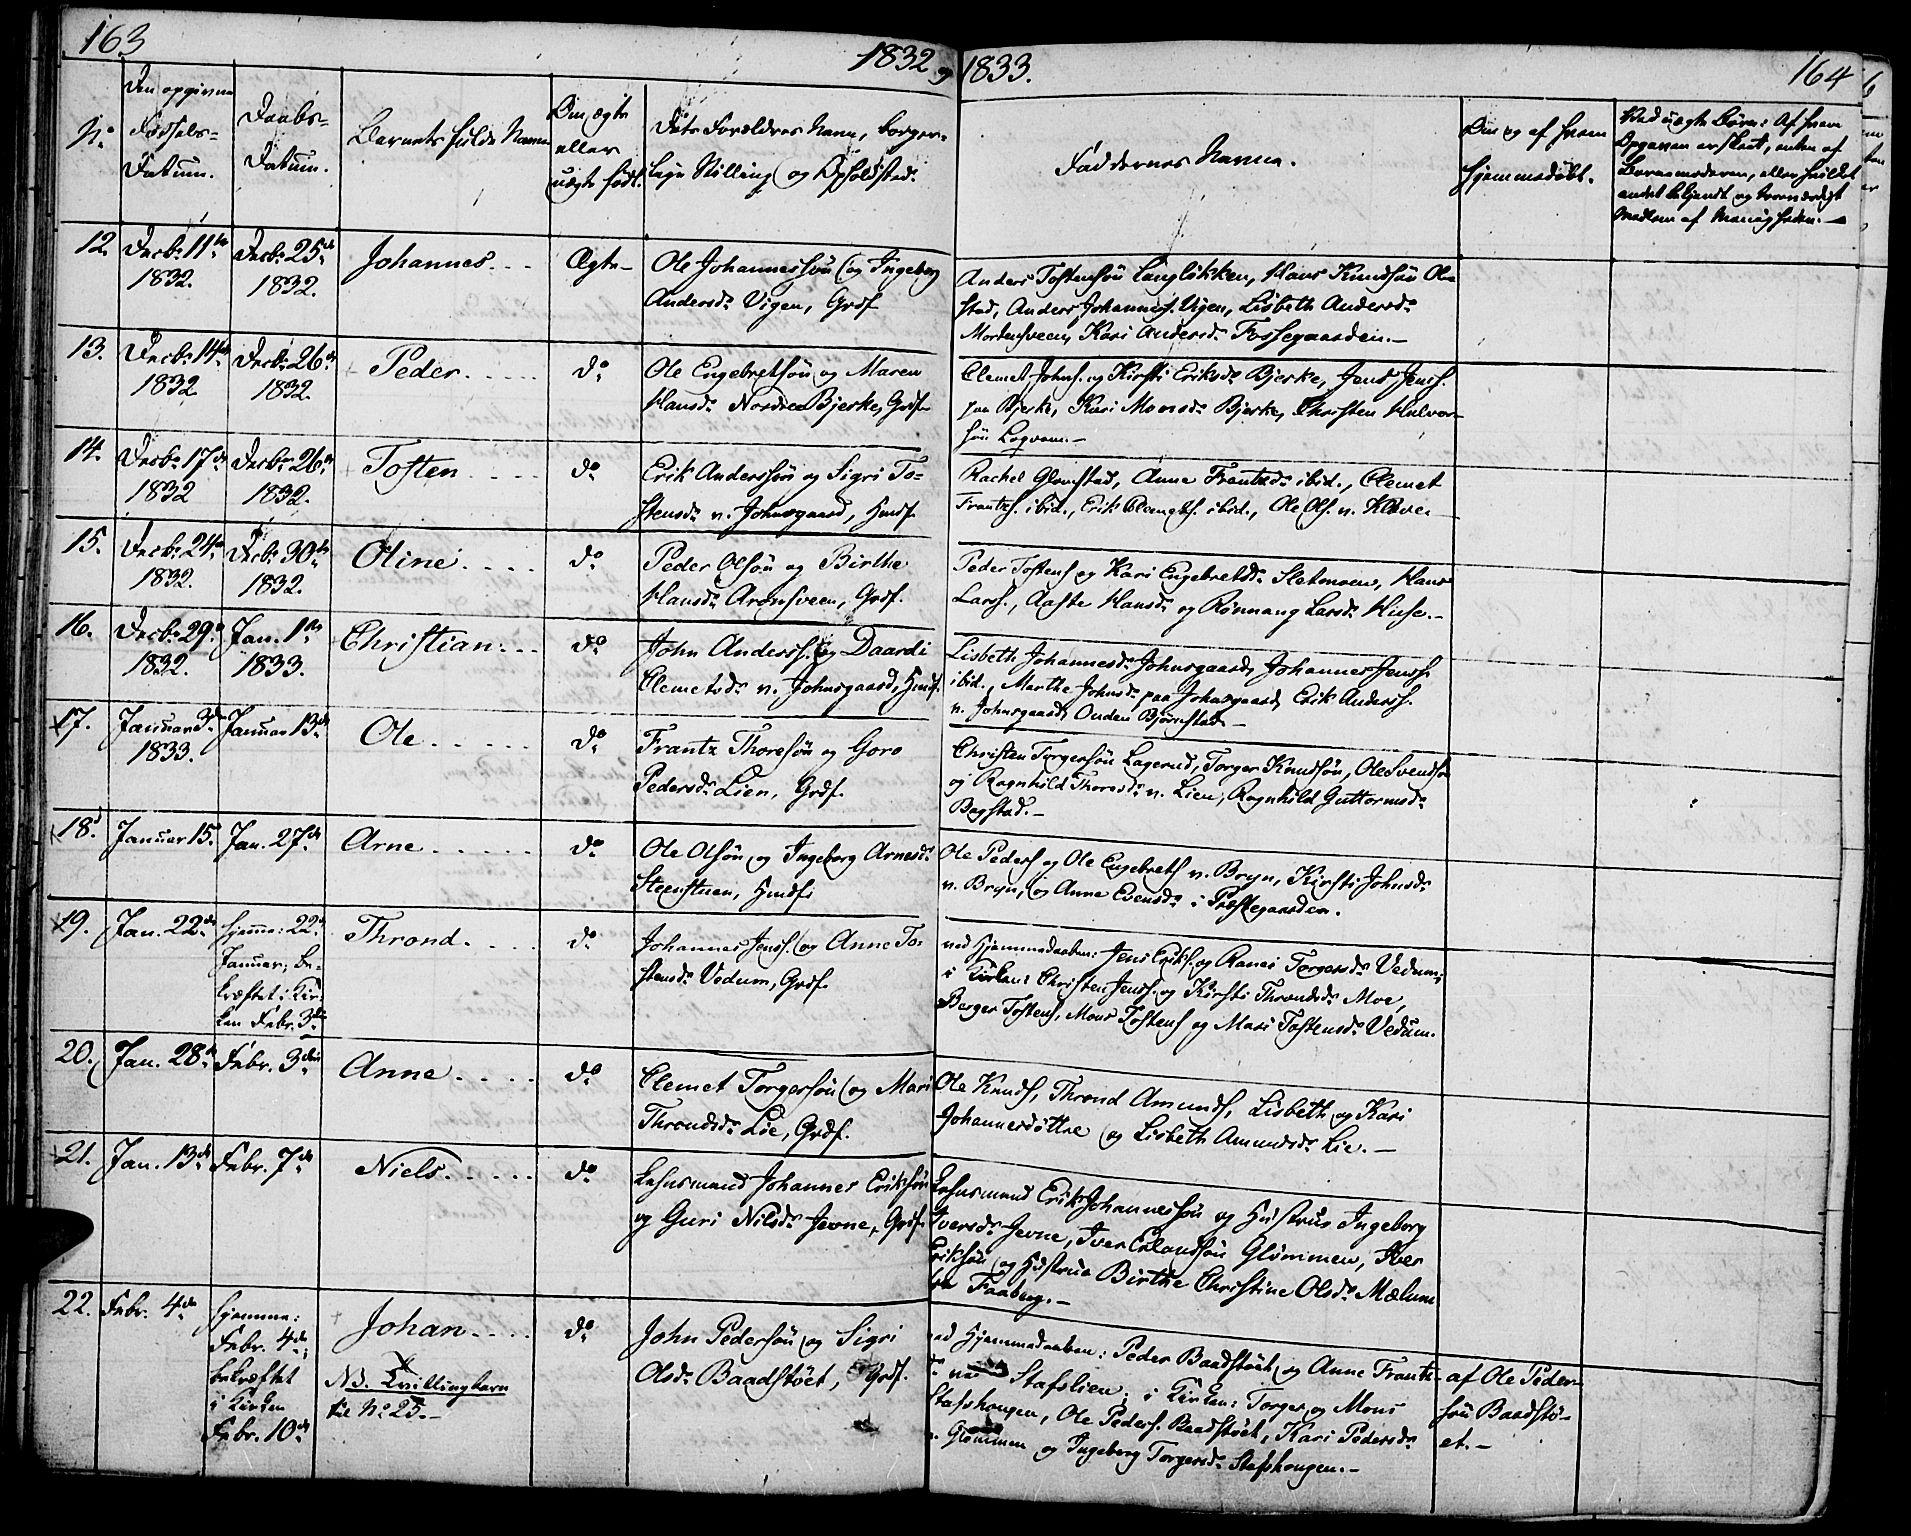 SAH, Øyer prestekontor, Ministerialbok nr. 4, 1824-1841, s. 163-164